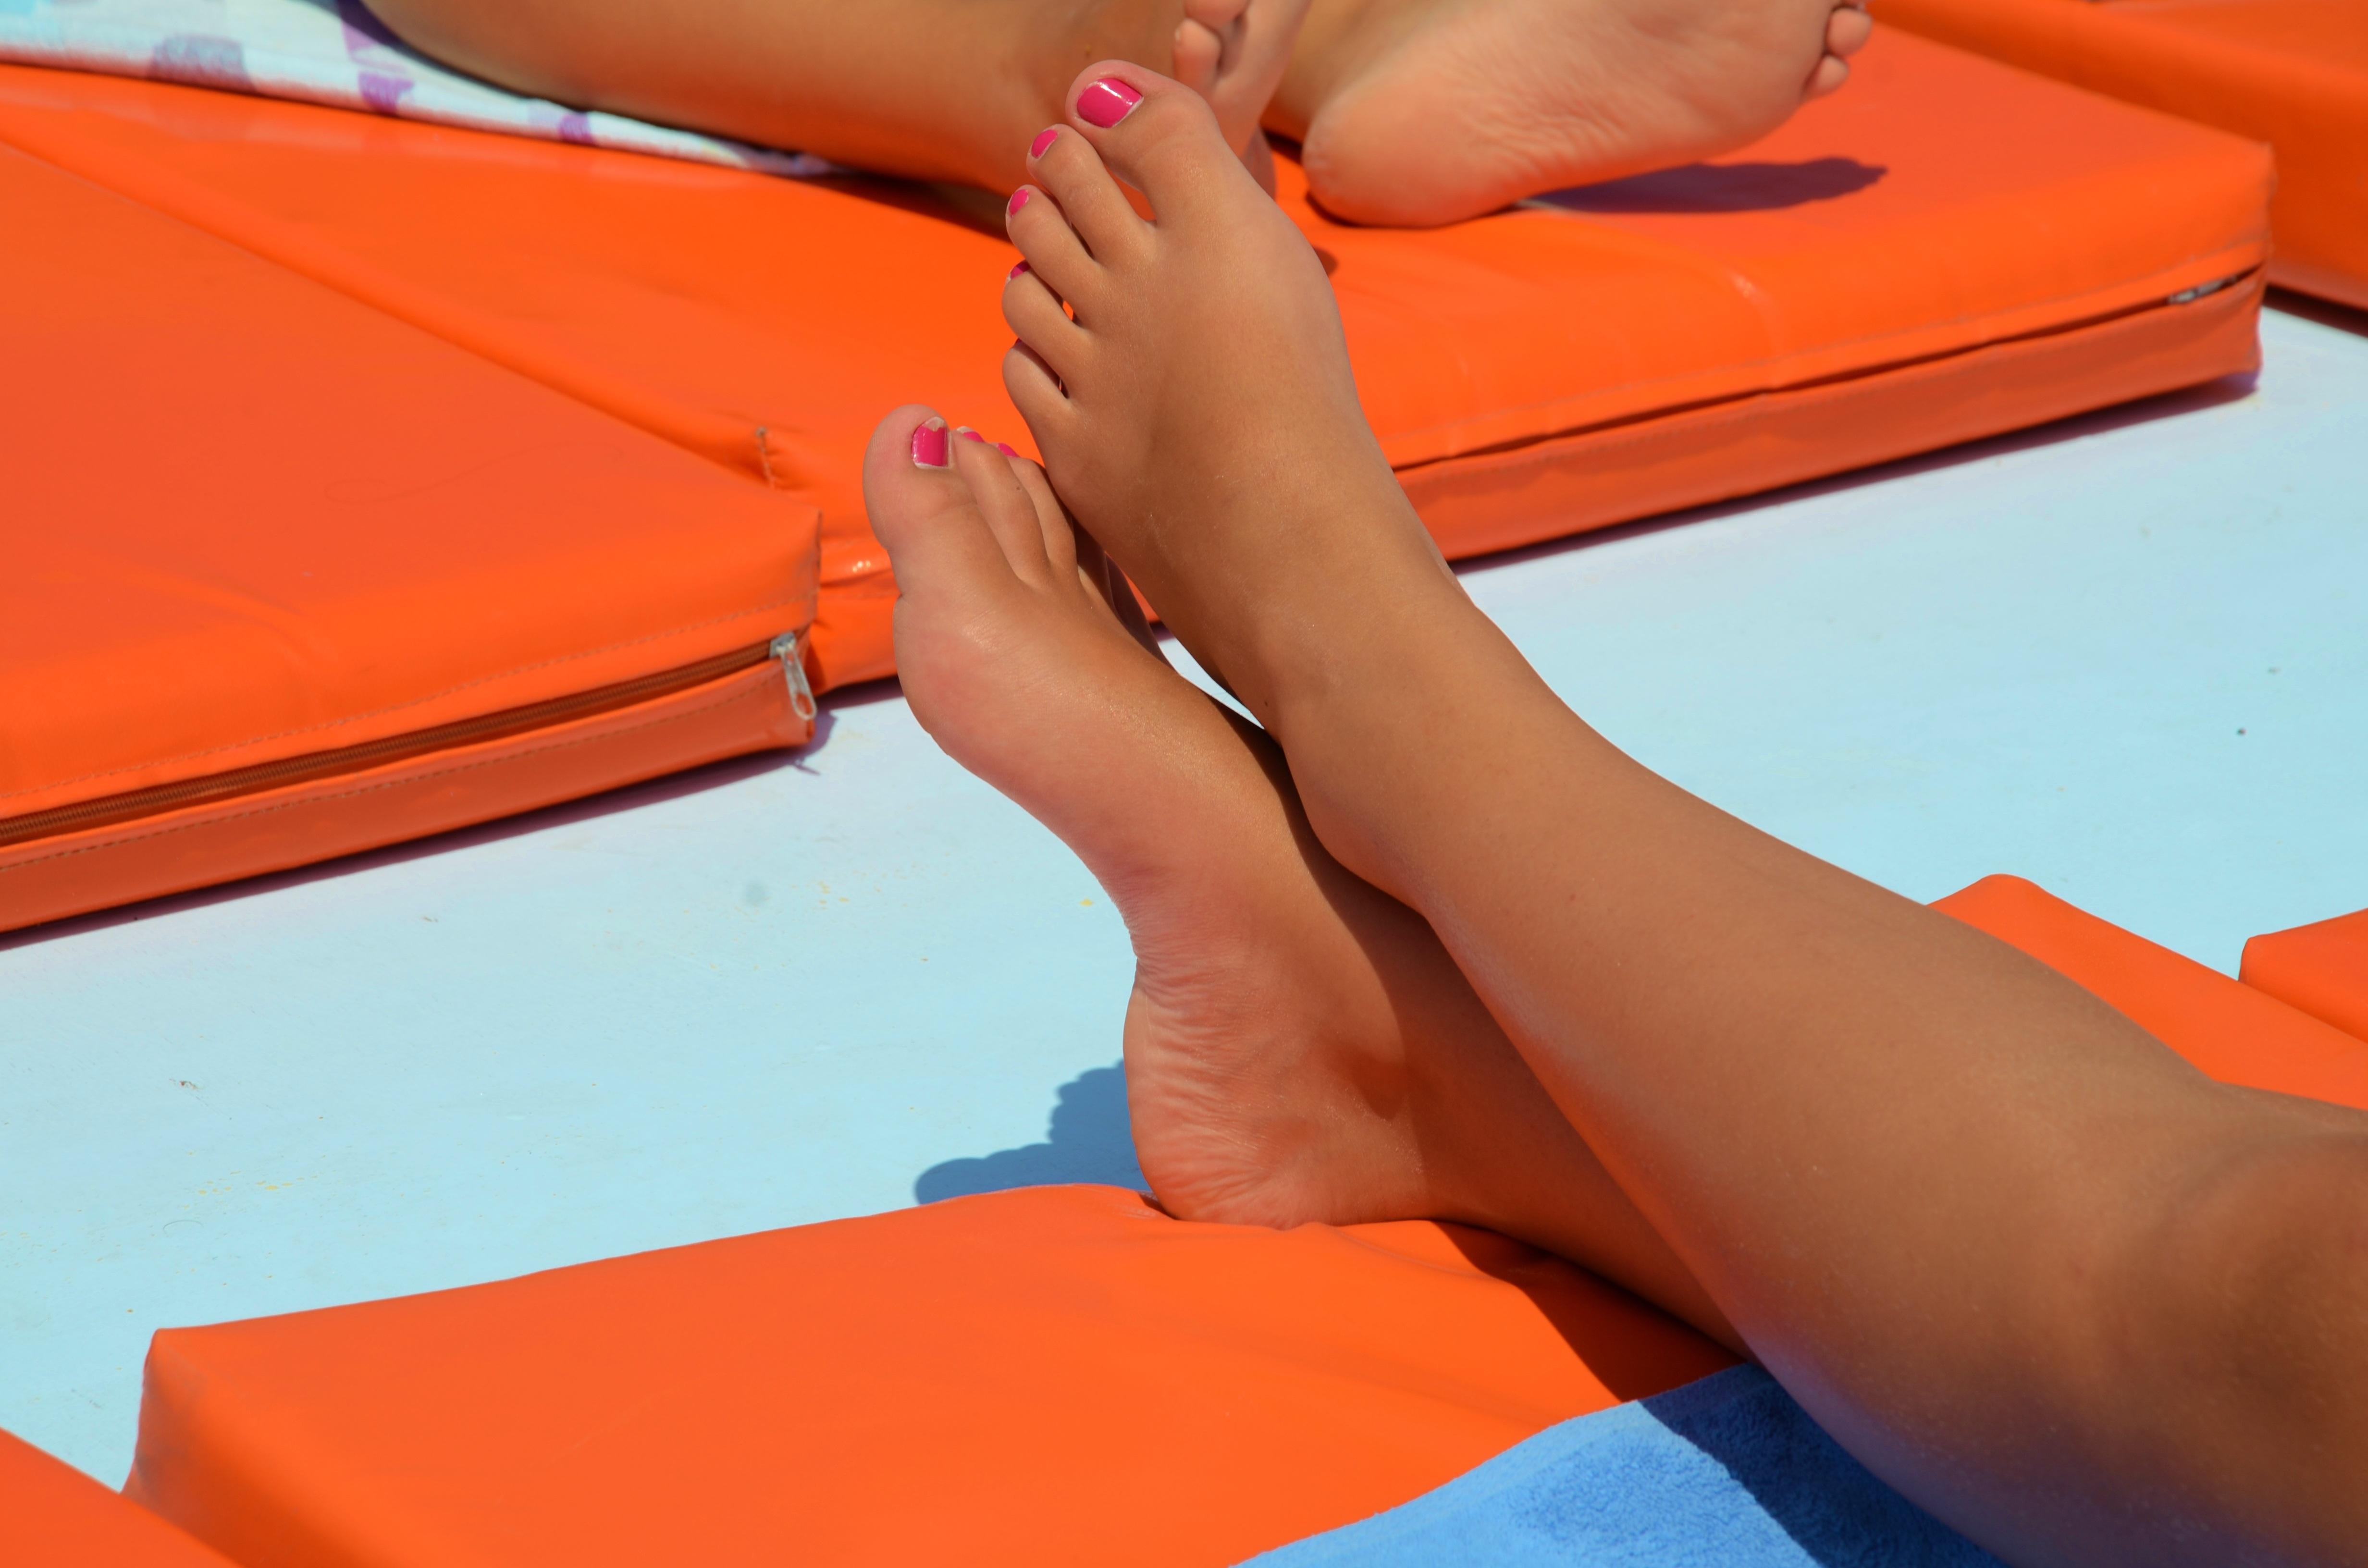 free images : hand, beach, feet, summer, female, leg, foot, holiday